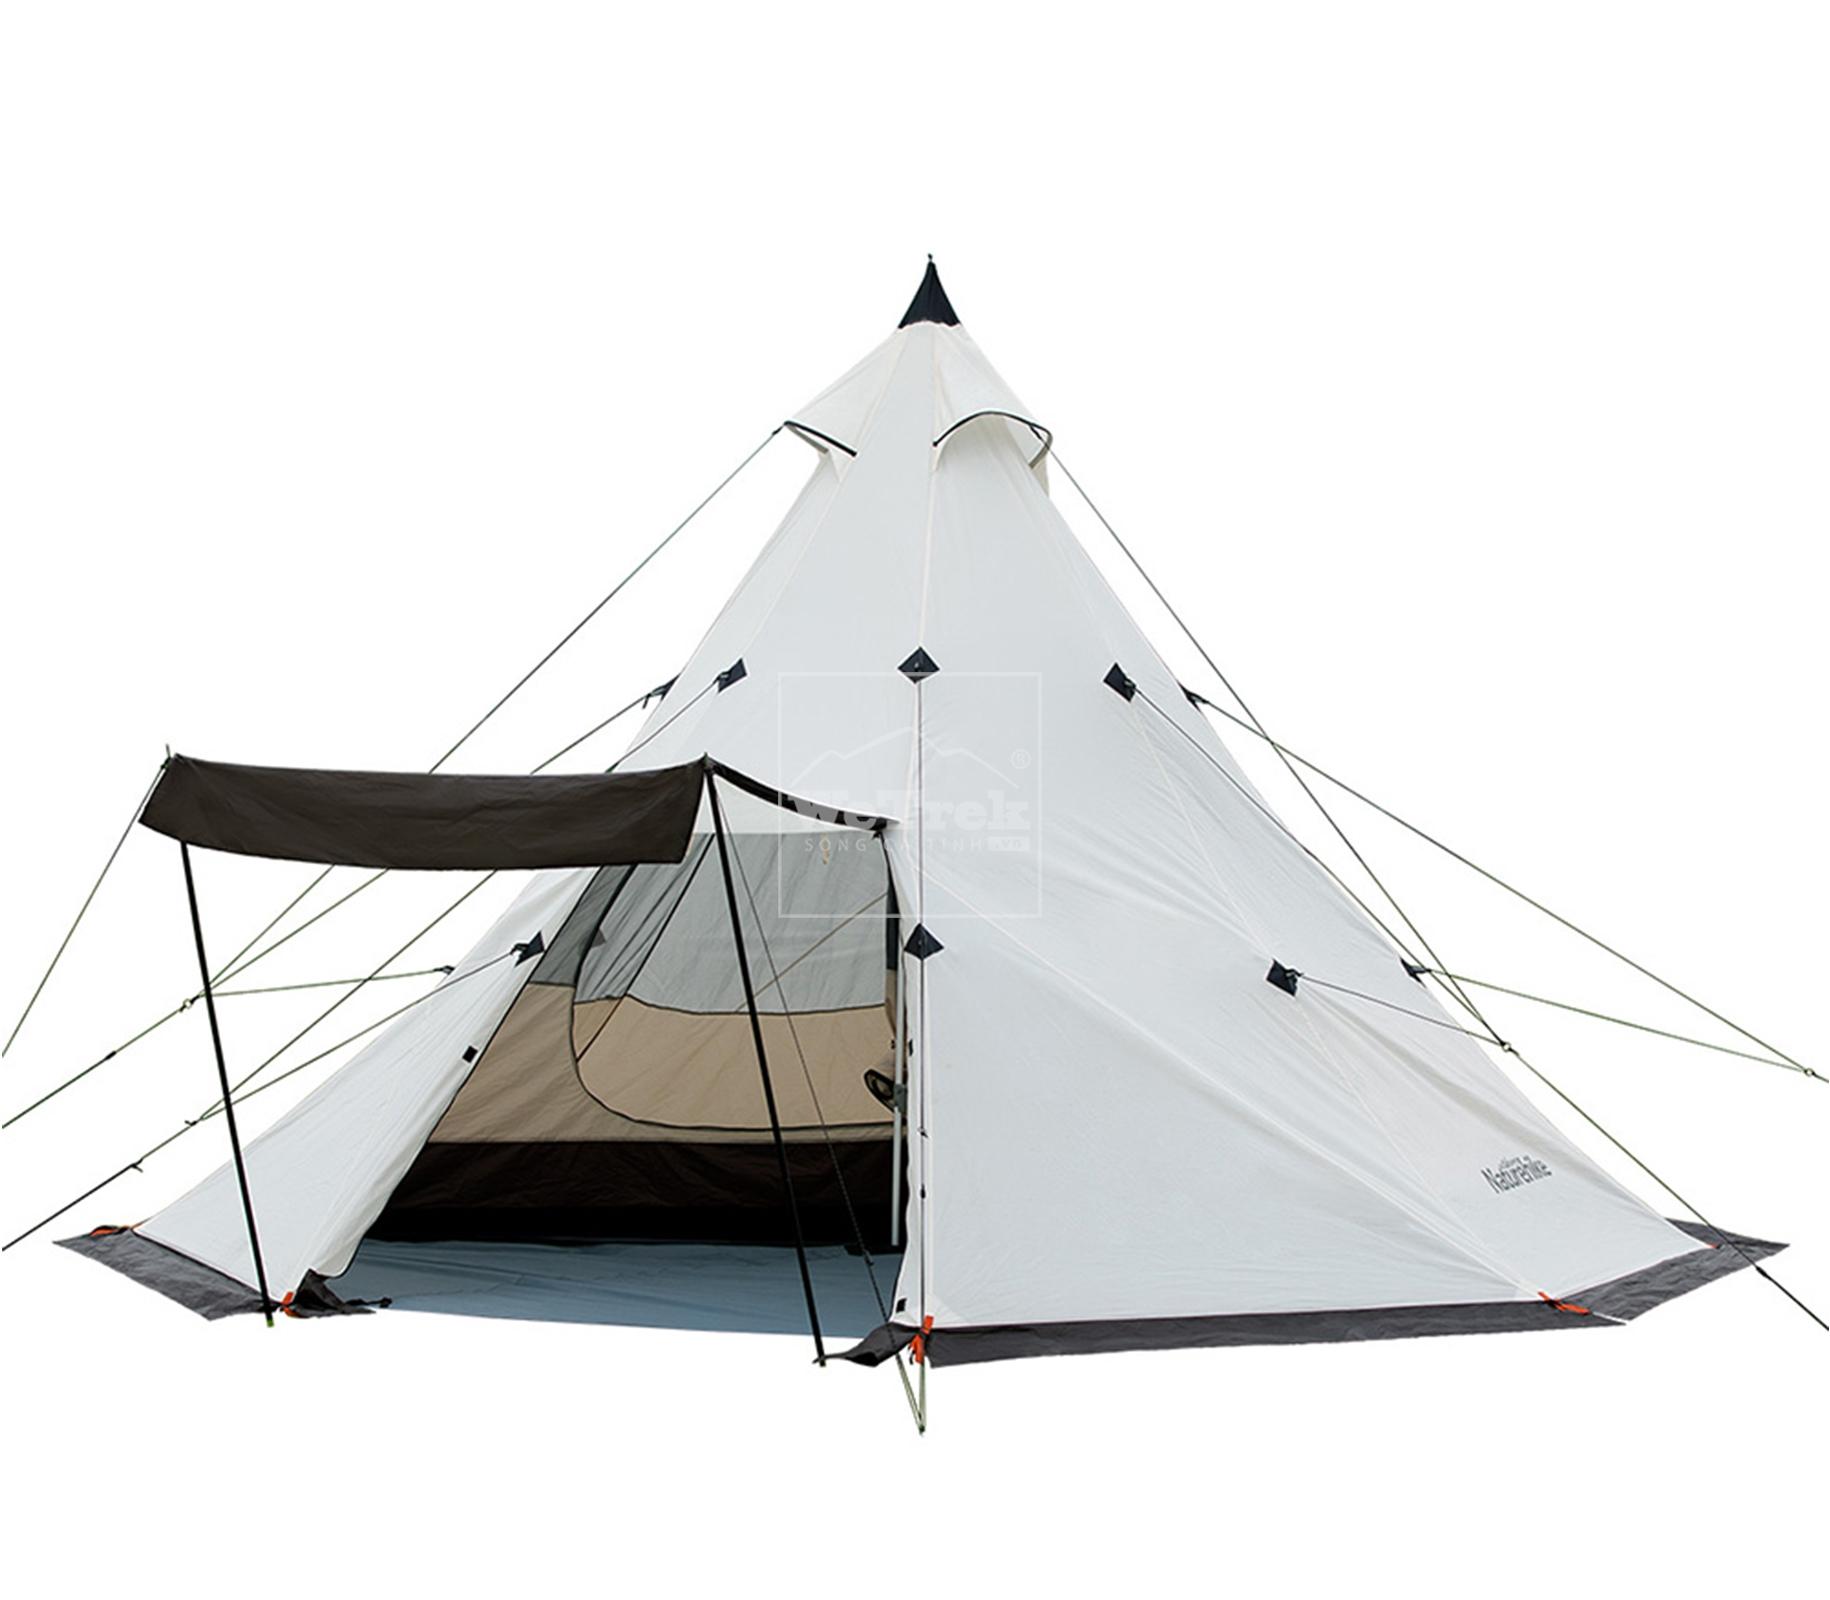 Lều cắm trại 8 người Naturehike Foldable Waterproof Double Layer Pyramid Tent NH17T200-L